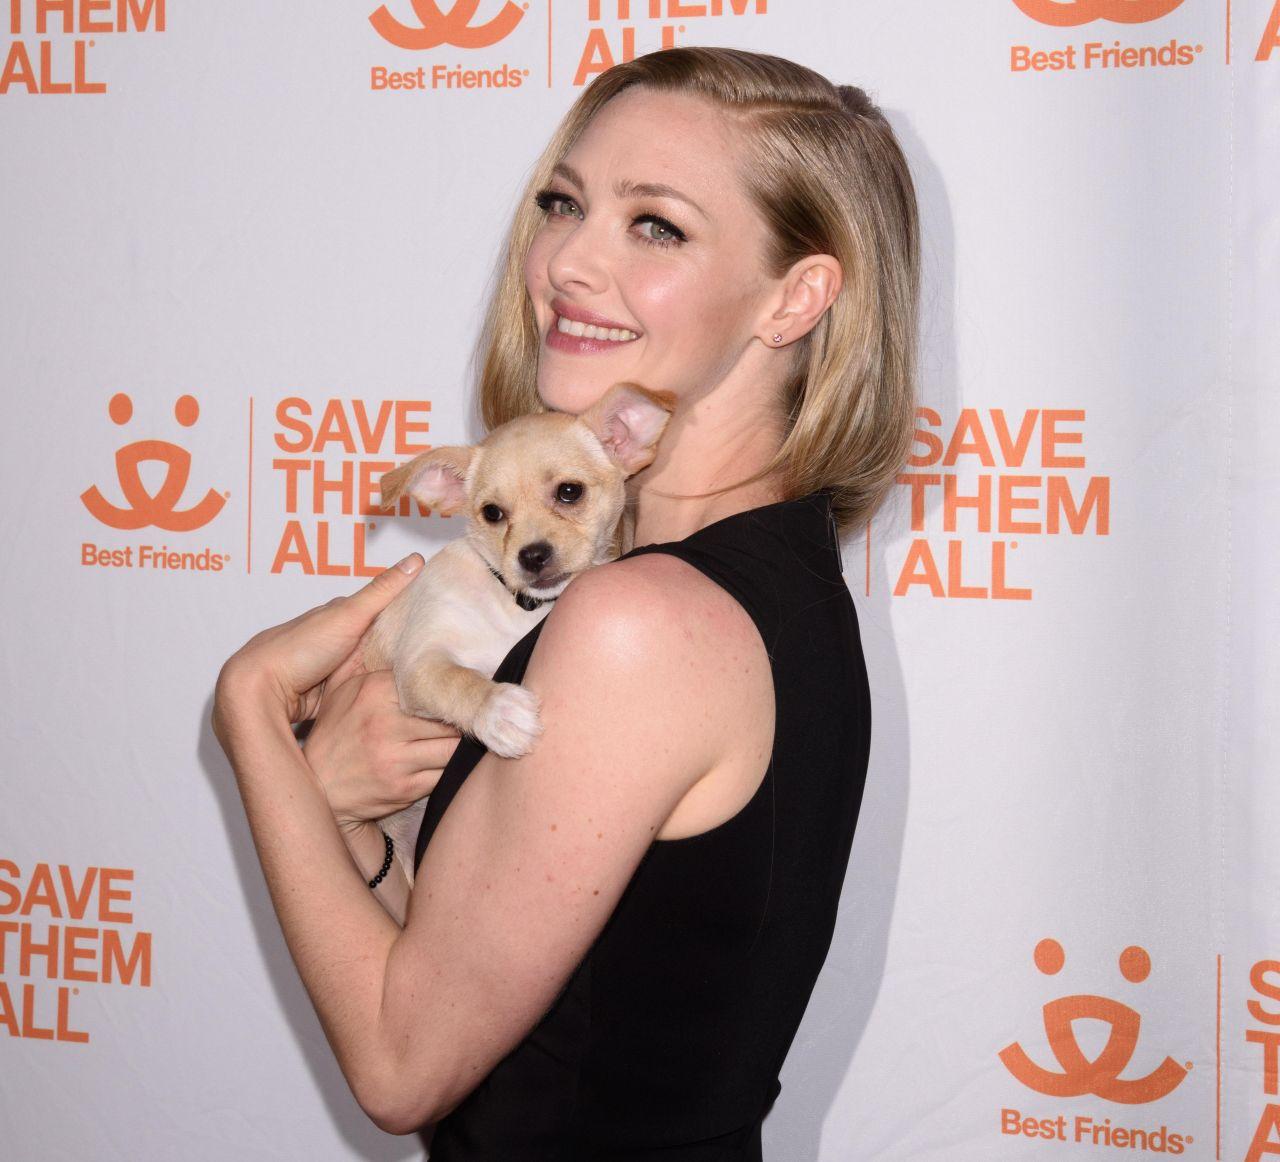 http://celebmafia.com/wp-content/uploads/2018/04/amanda-seyfried-best-friends-animal-society-s-save-them-all-gala-in-nyc-11.jpg